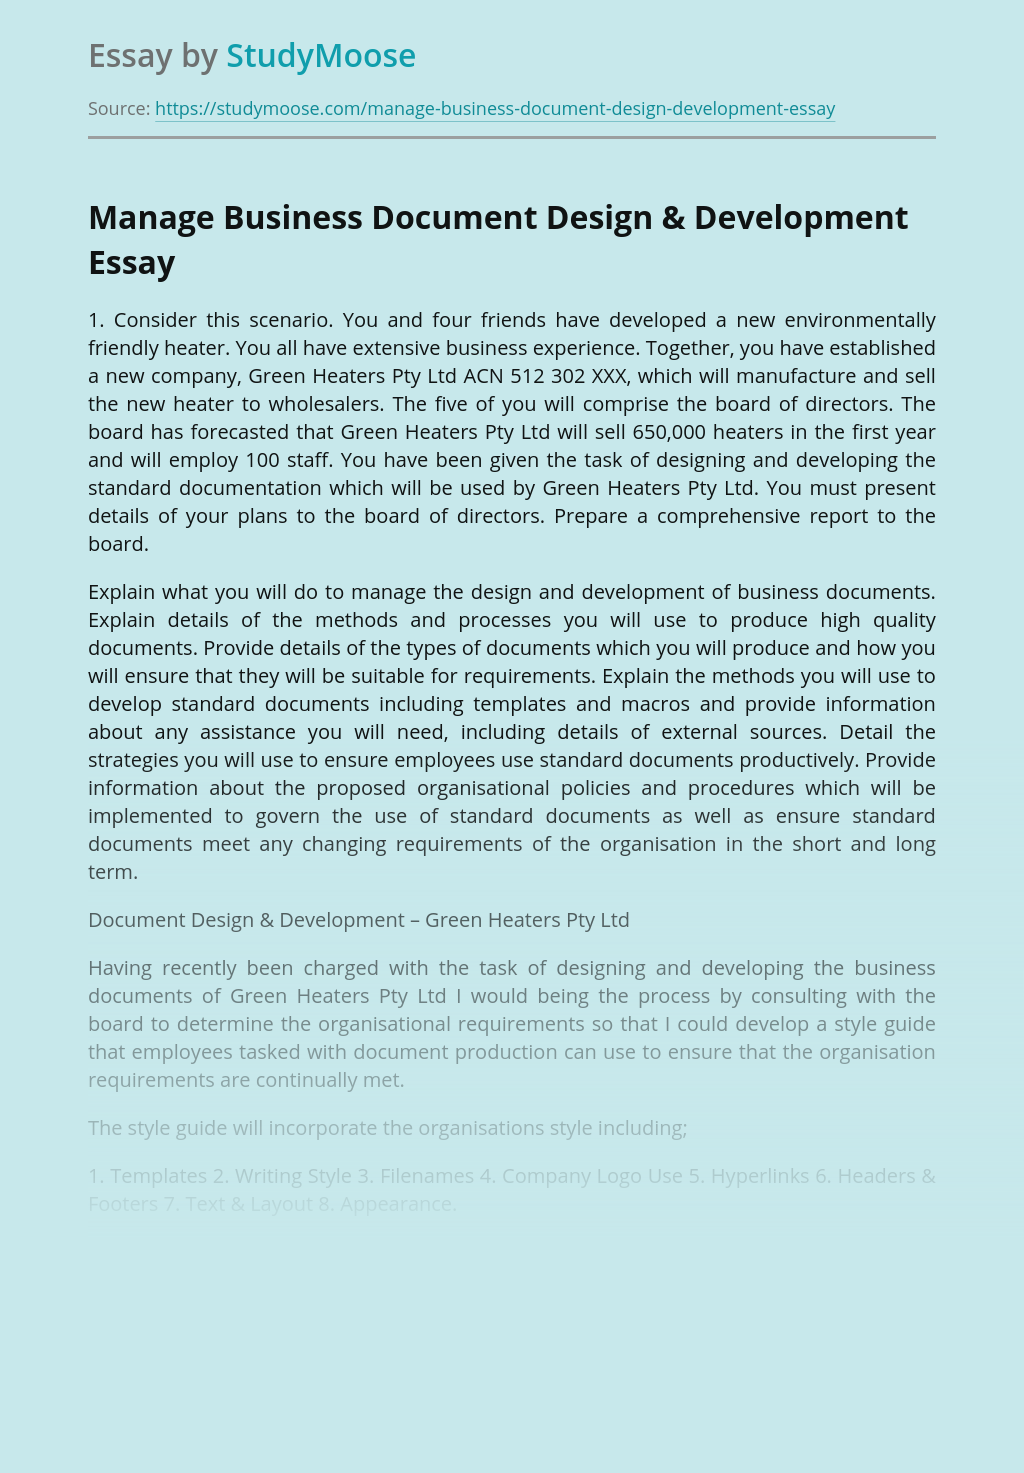 Manage Business Document Design & Development